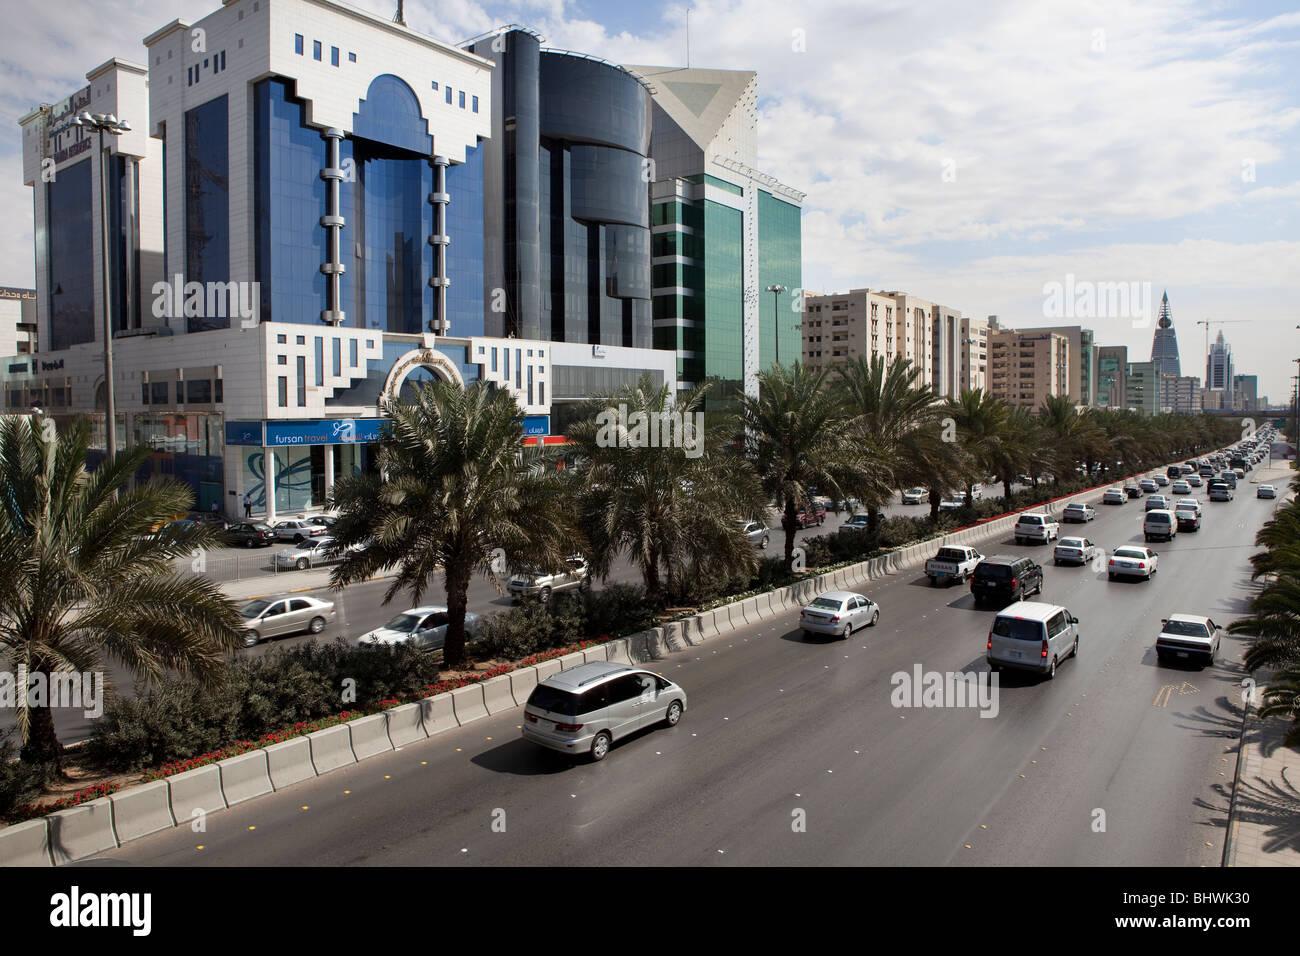 Moderne de la circulation rue animée Riyadh Arabie Saoudite Photo Stock